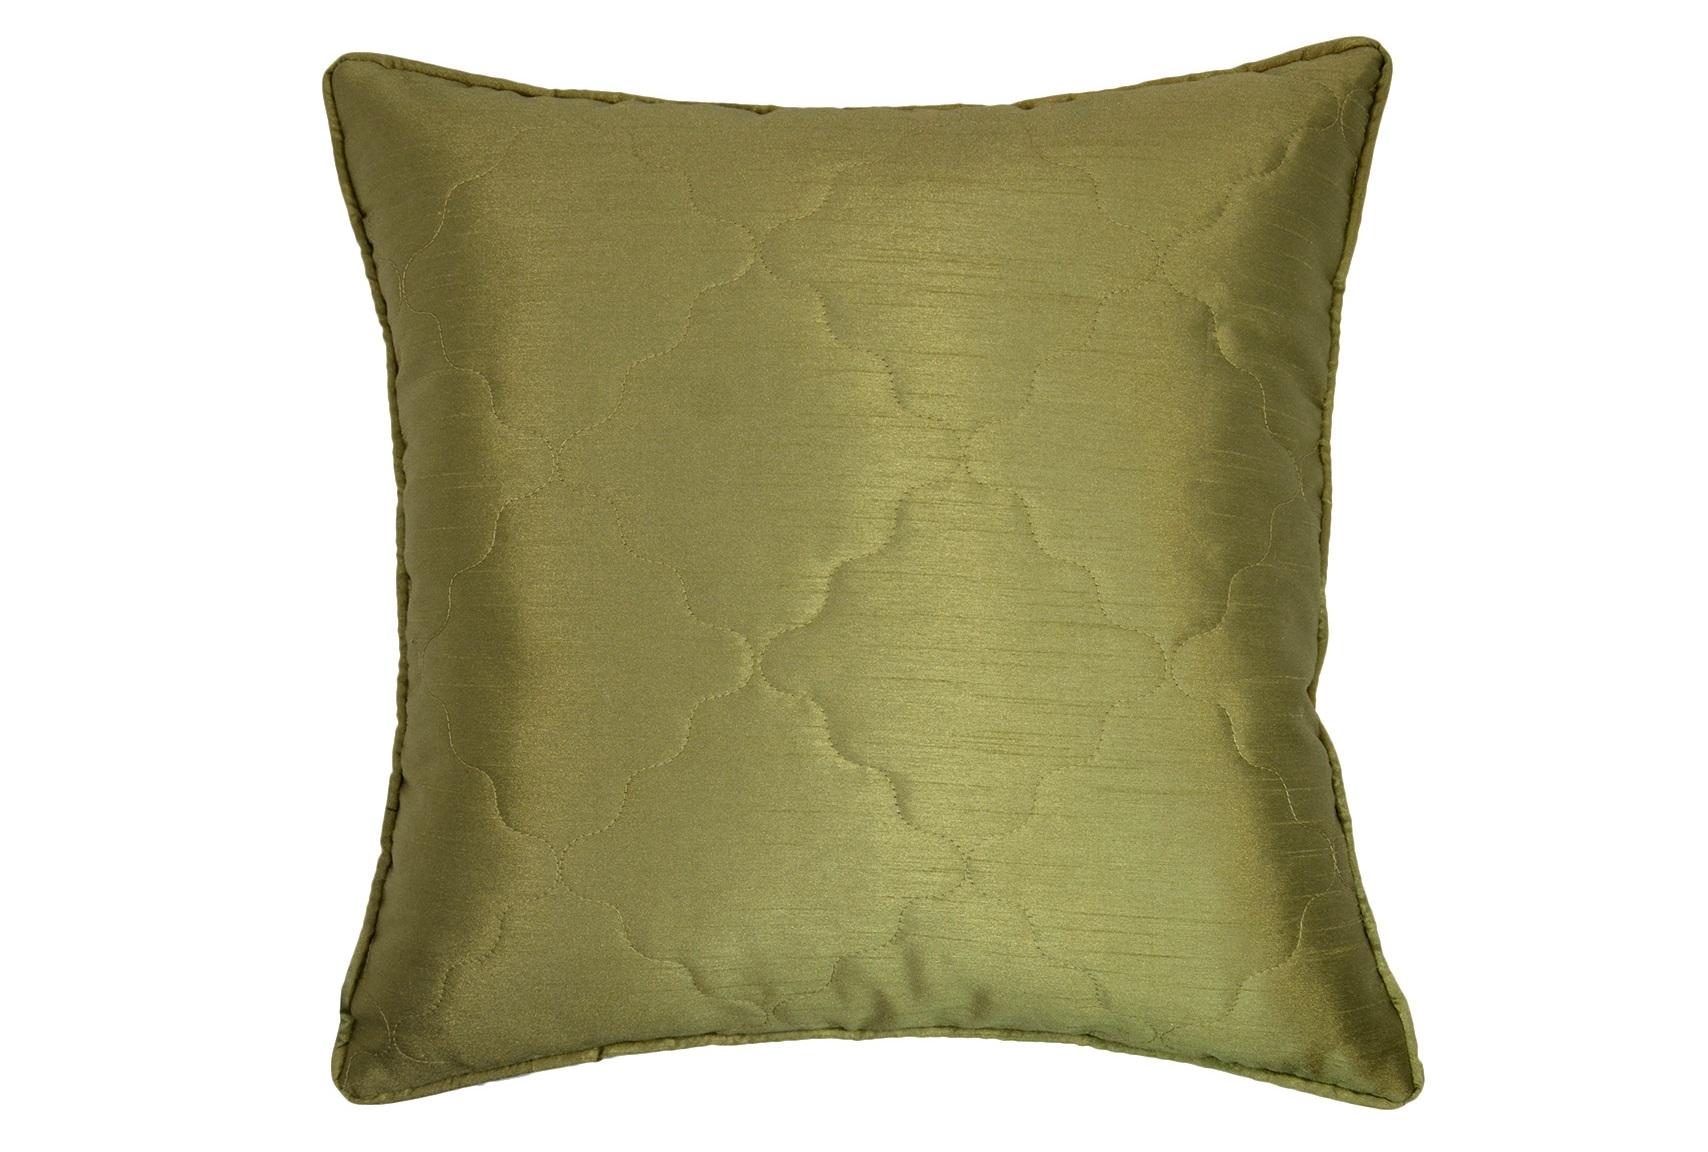 Подушка Green SilkКвадратные подушки<br>Декоративная  подушка .Чехол съемный.<br><br>Material: Вискоза<br>Length см: None<br>Width см: 45<br>Depth см: 15<br>Height см: 45